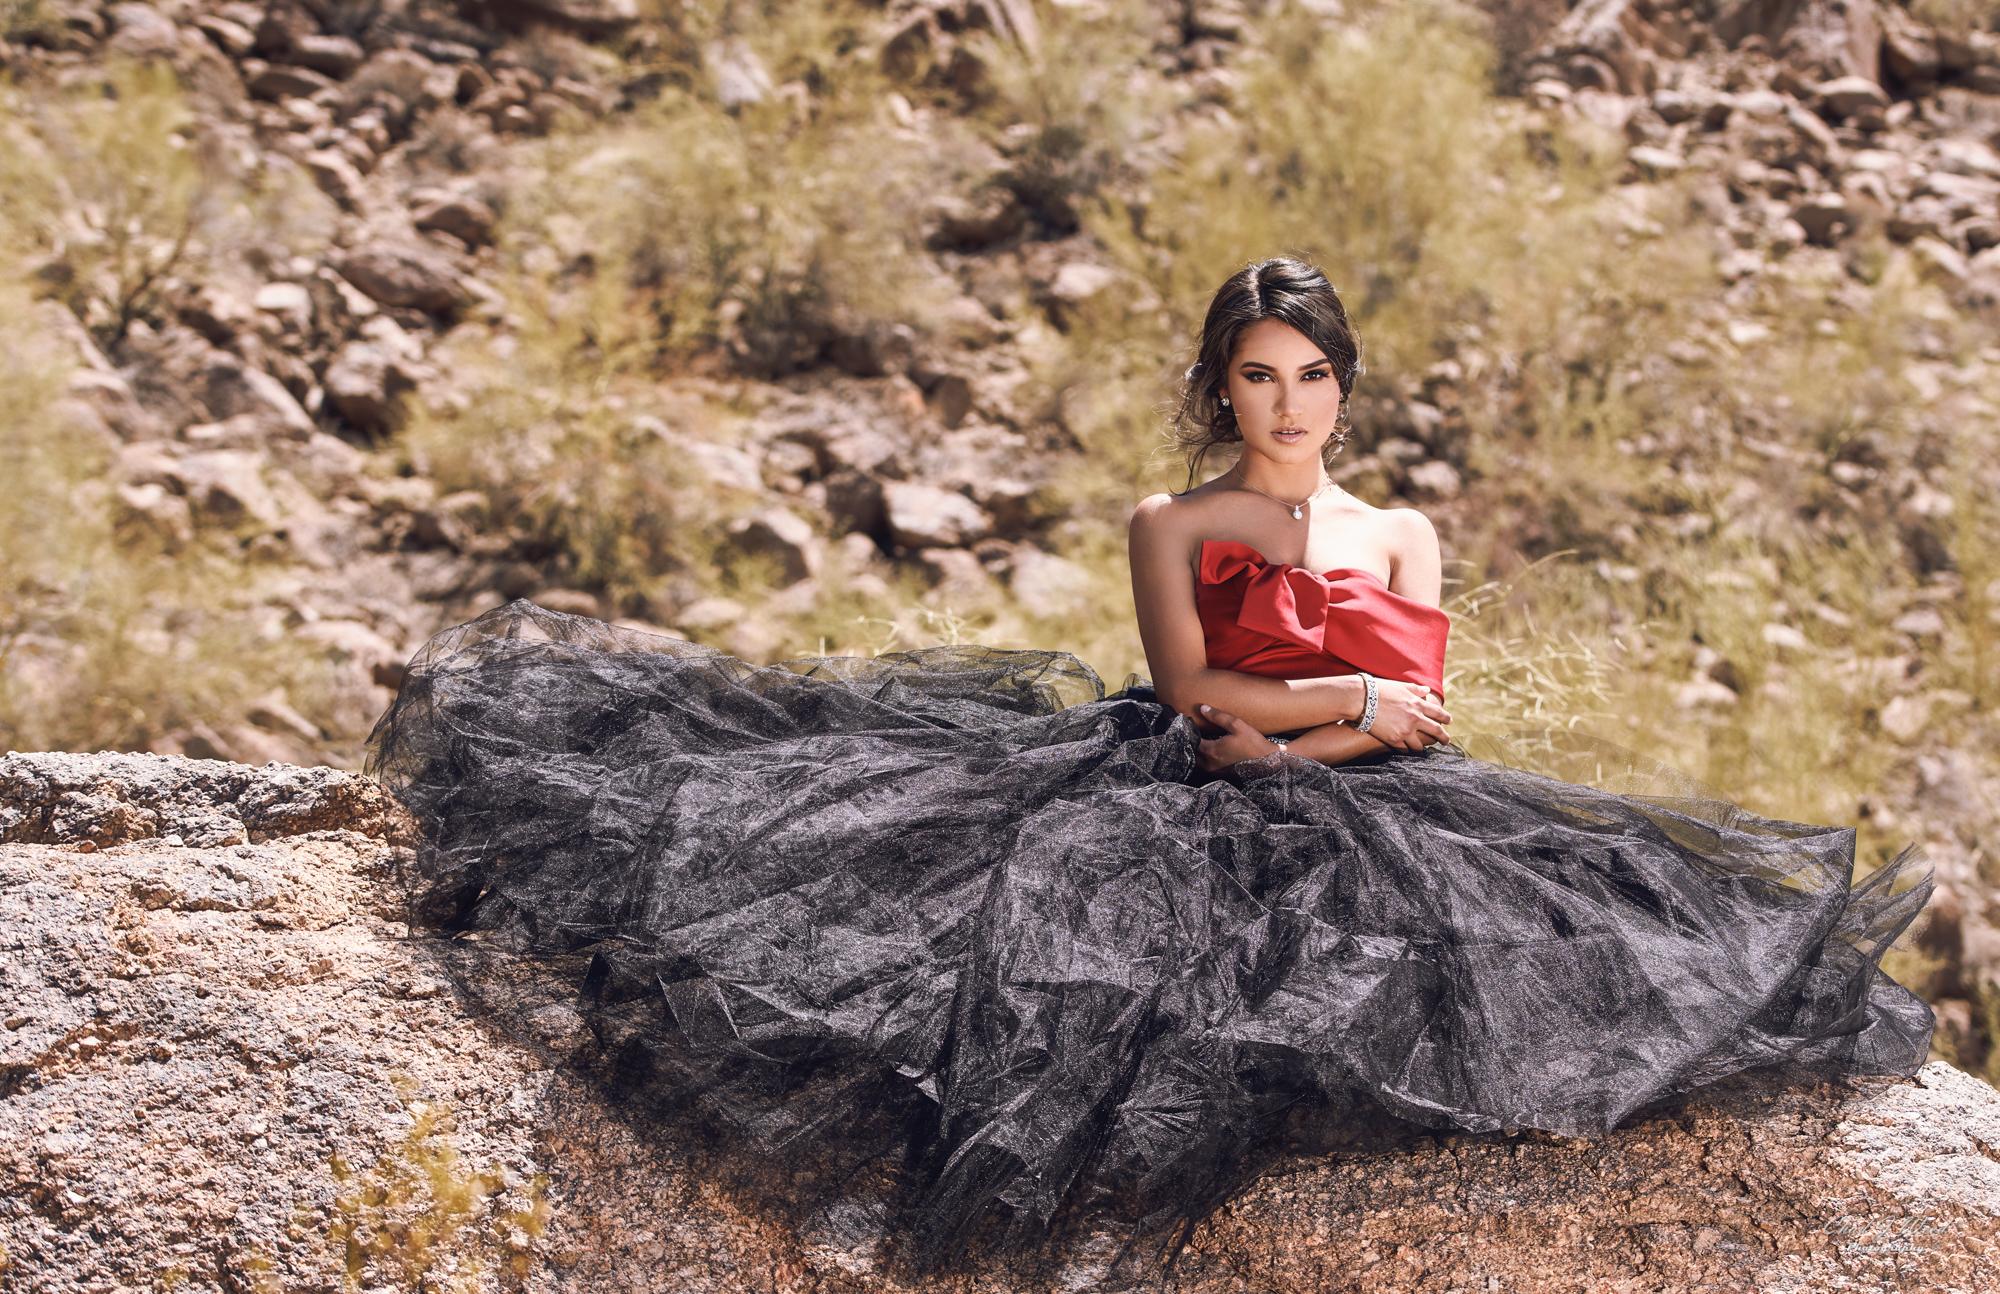 Beauty Model Zari by Mesa Arizona Beauty Photographer Chad Weed